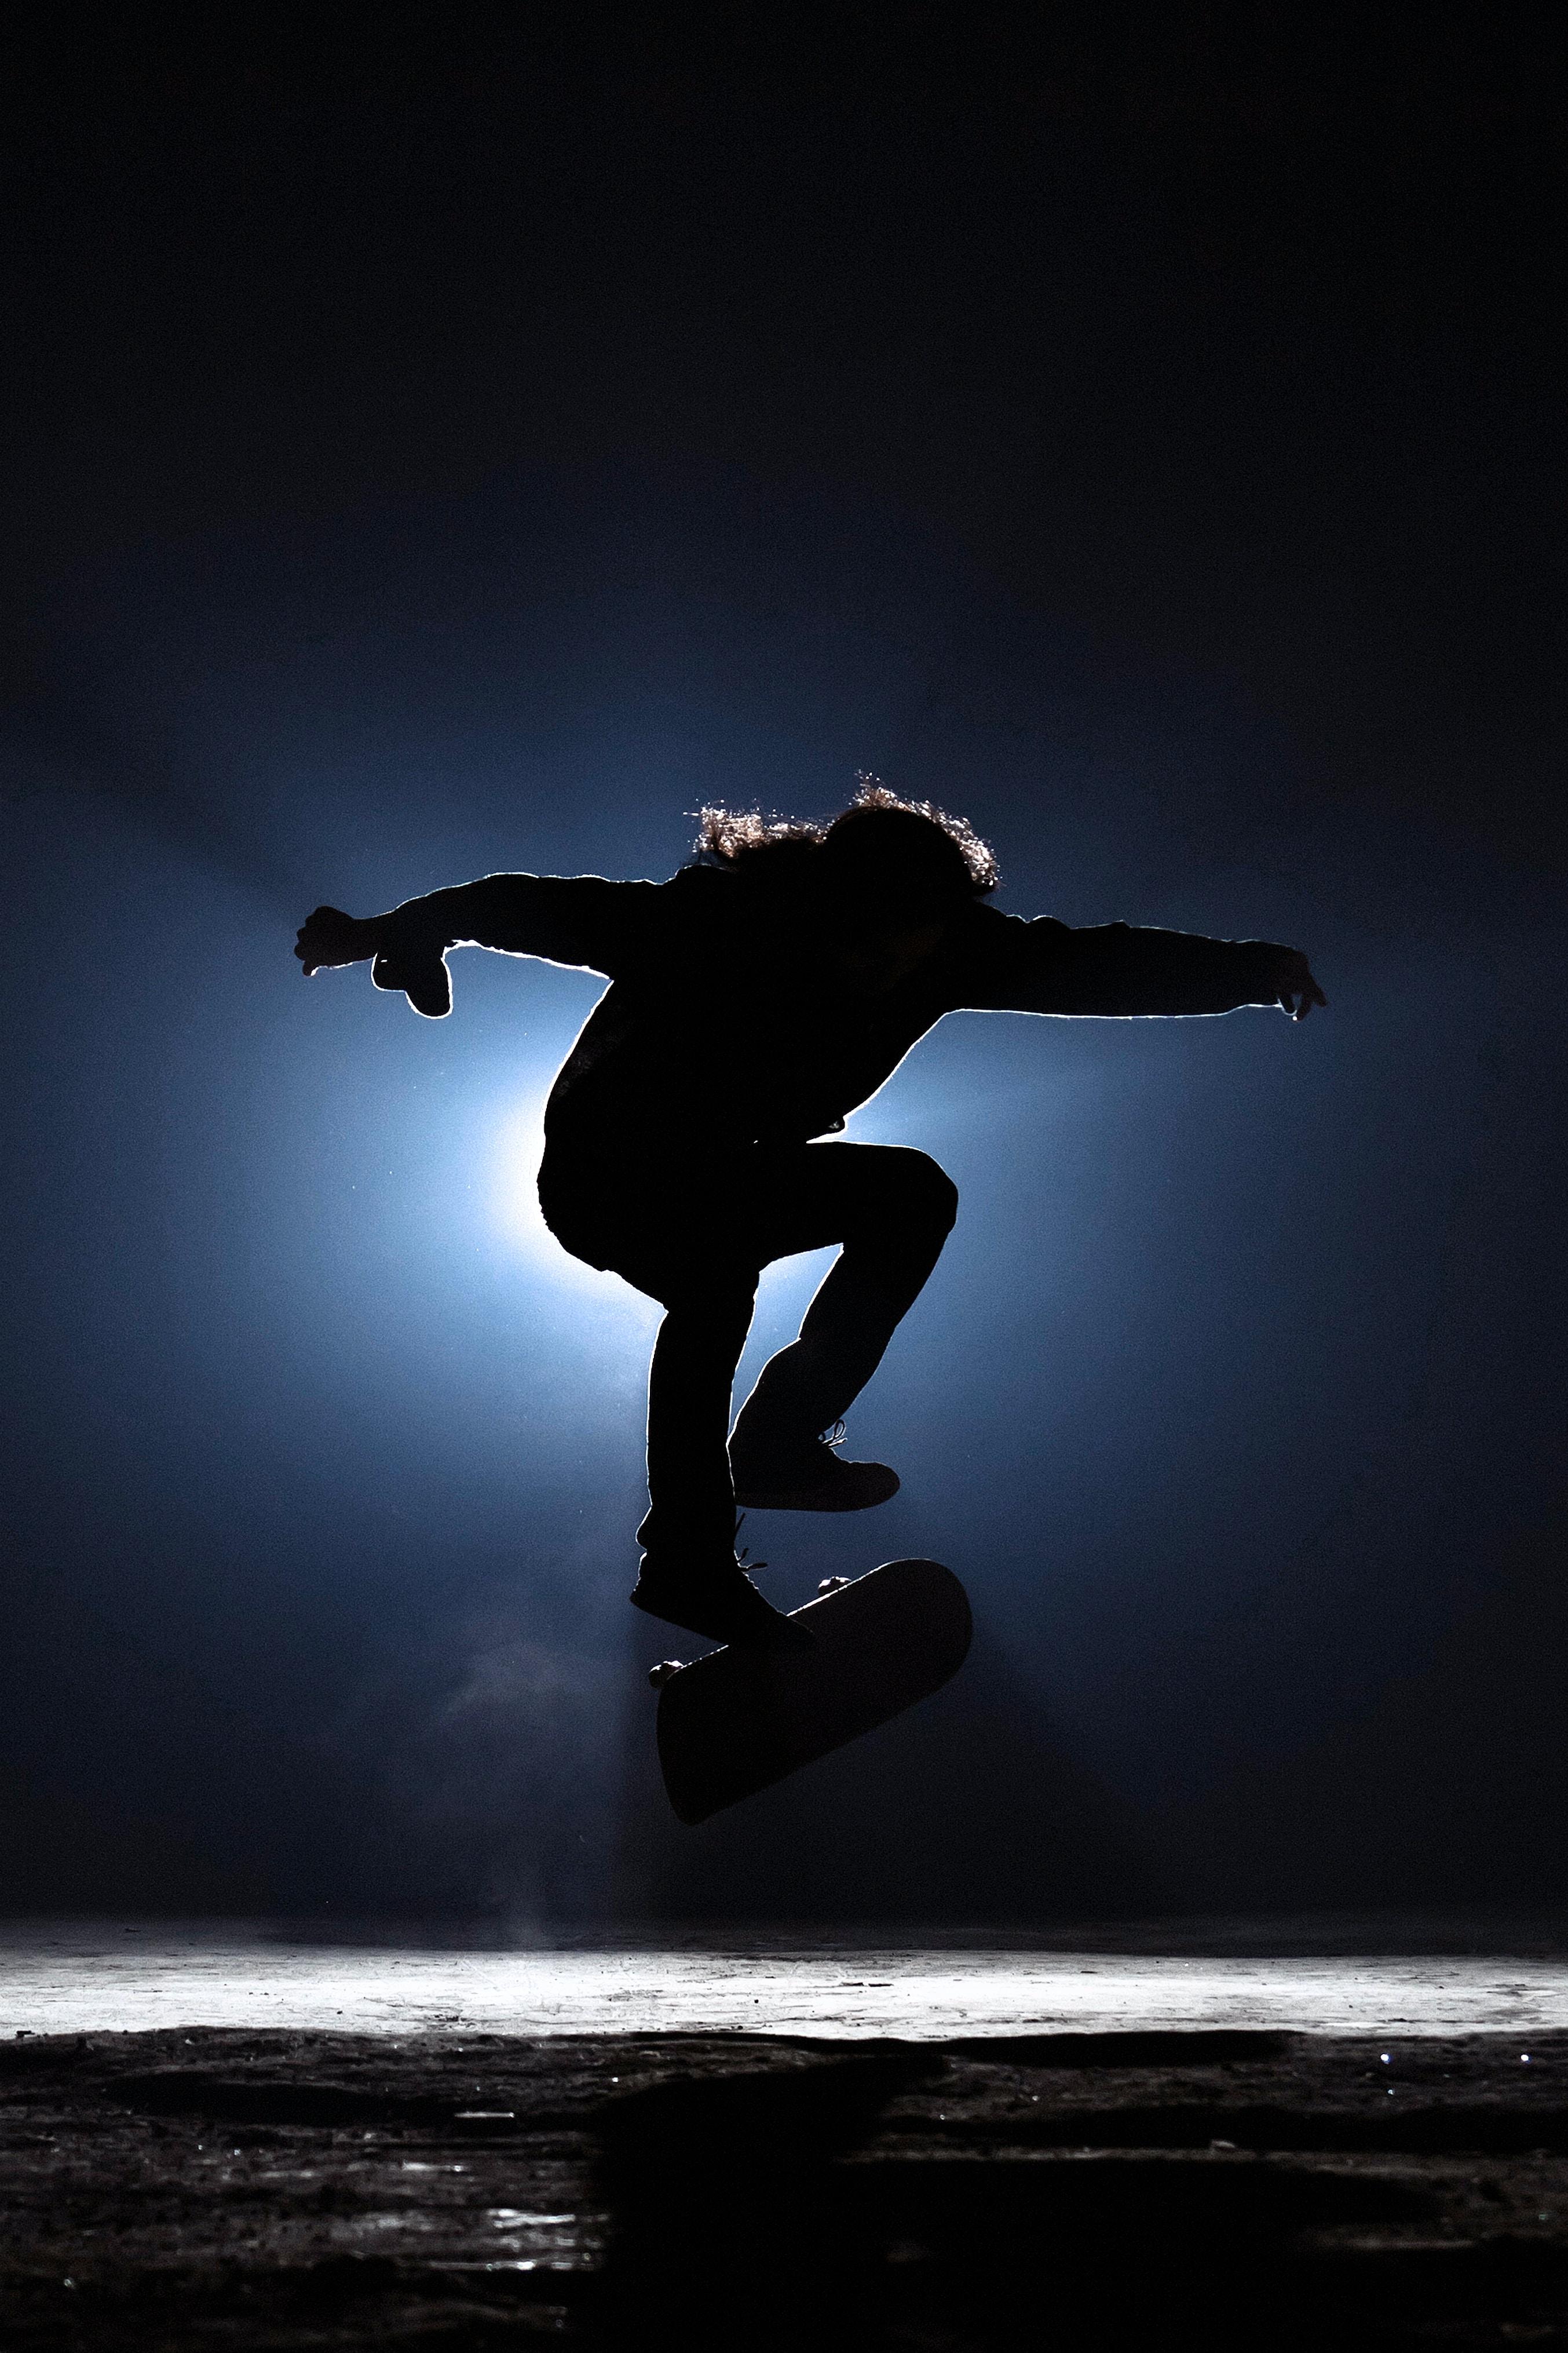 photo of man playing skateboard